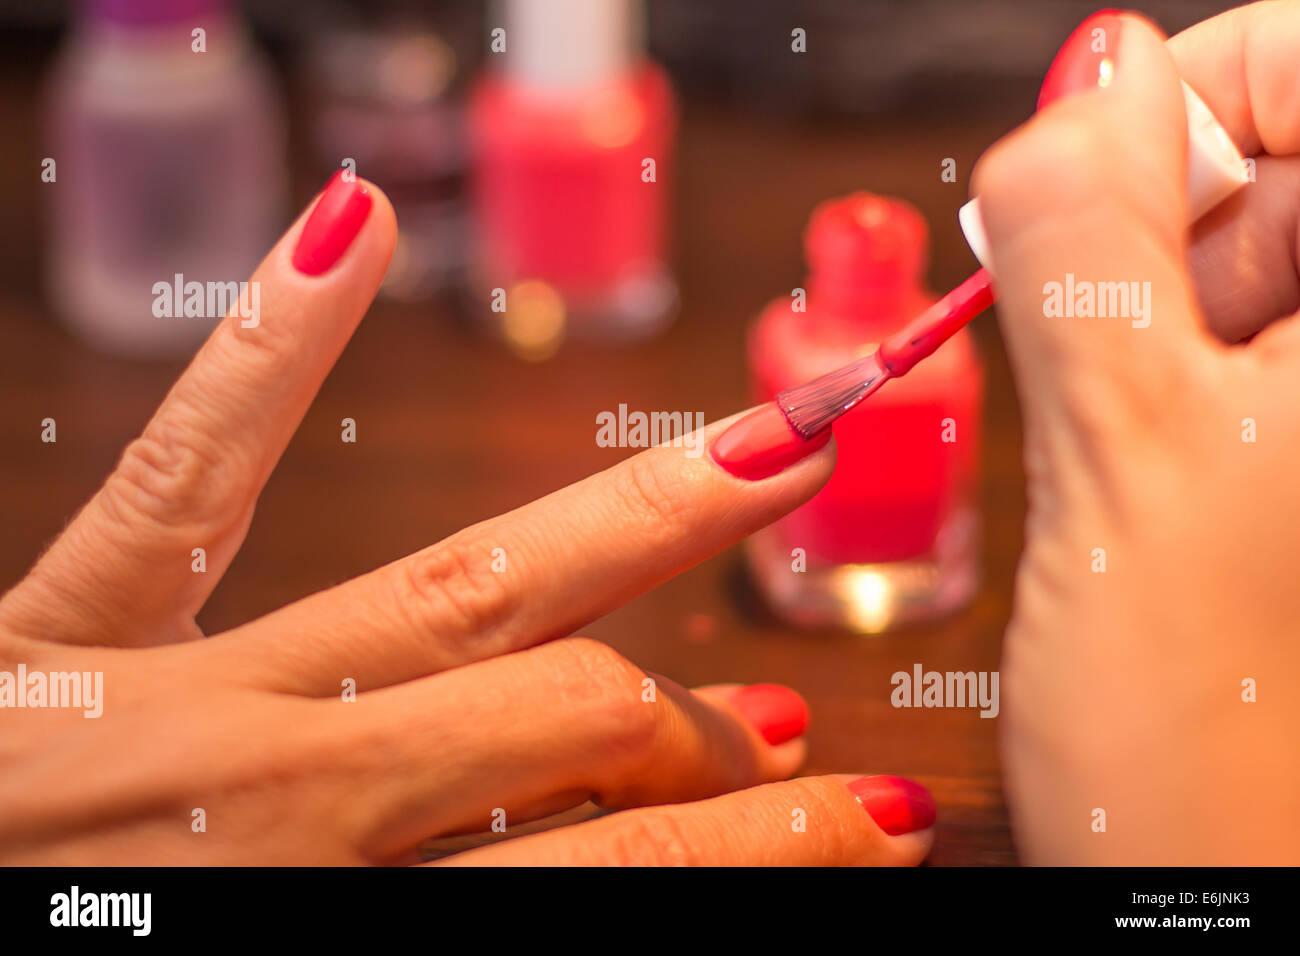 Red Finger Nails Stockfotos & Red Finger Nails Bilder - Alamy